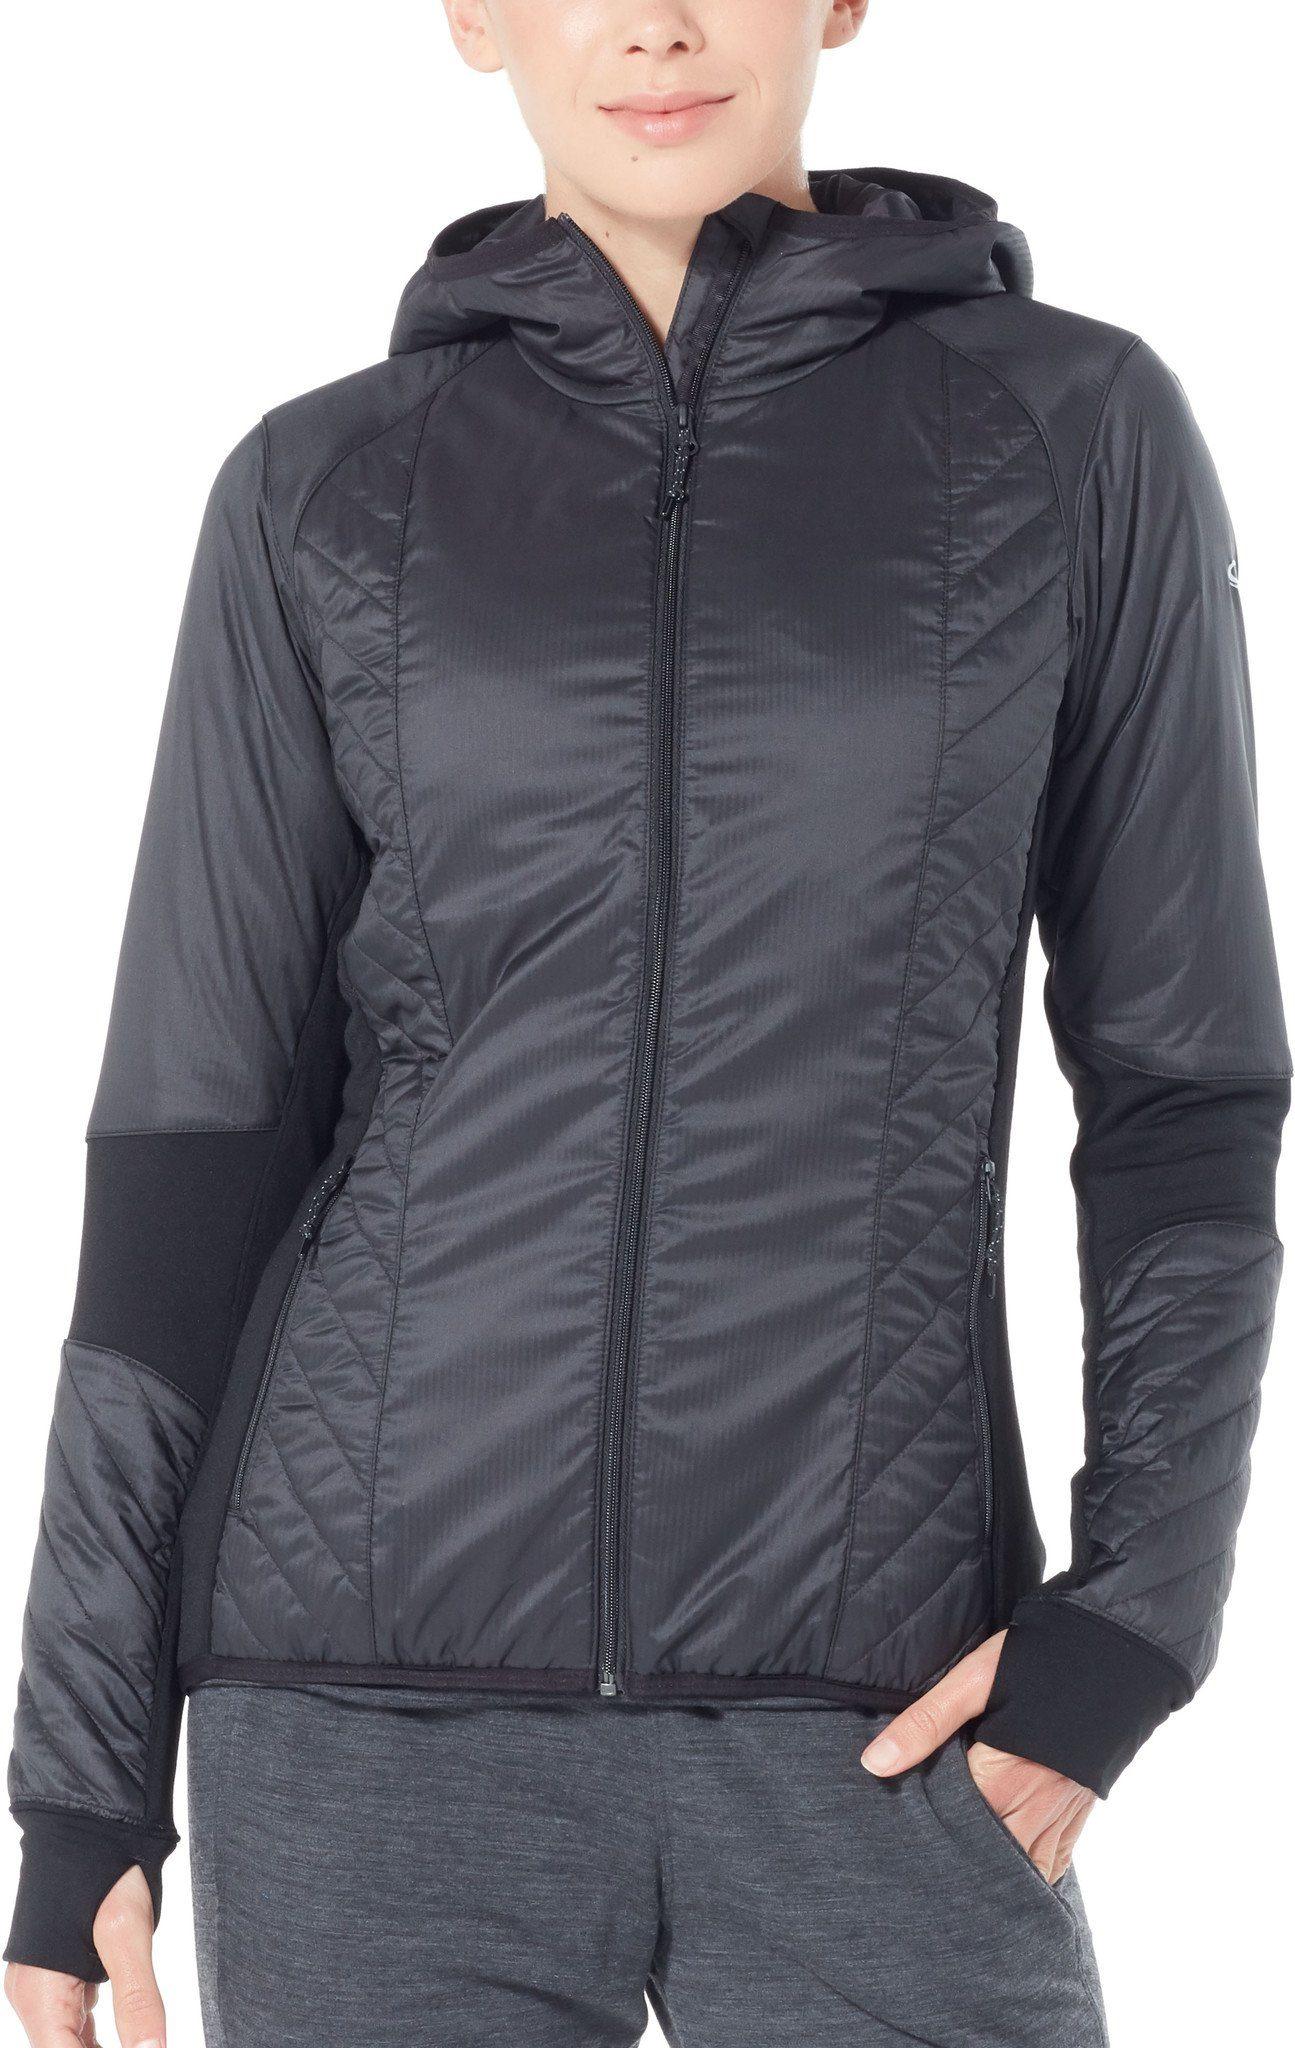 Icebreaker Outdoorjacke »Helix LS Zip Hood Jacket Women«, Modelljahr 2019 online kaufen   OTTO